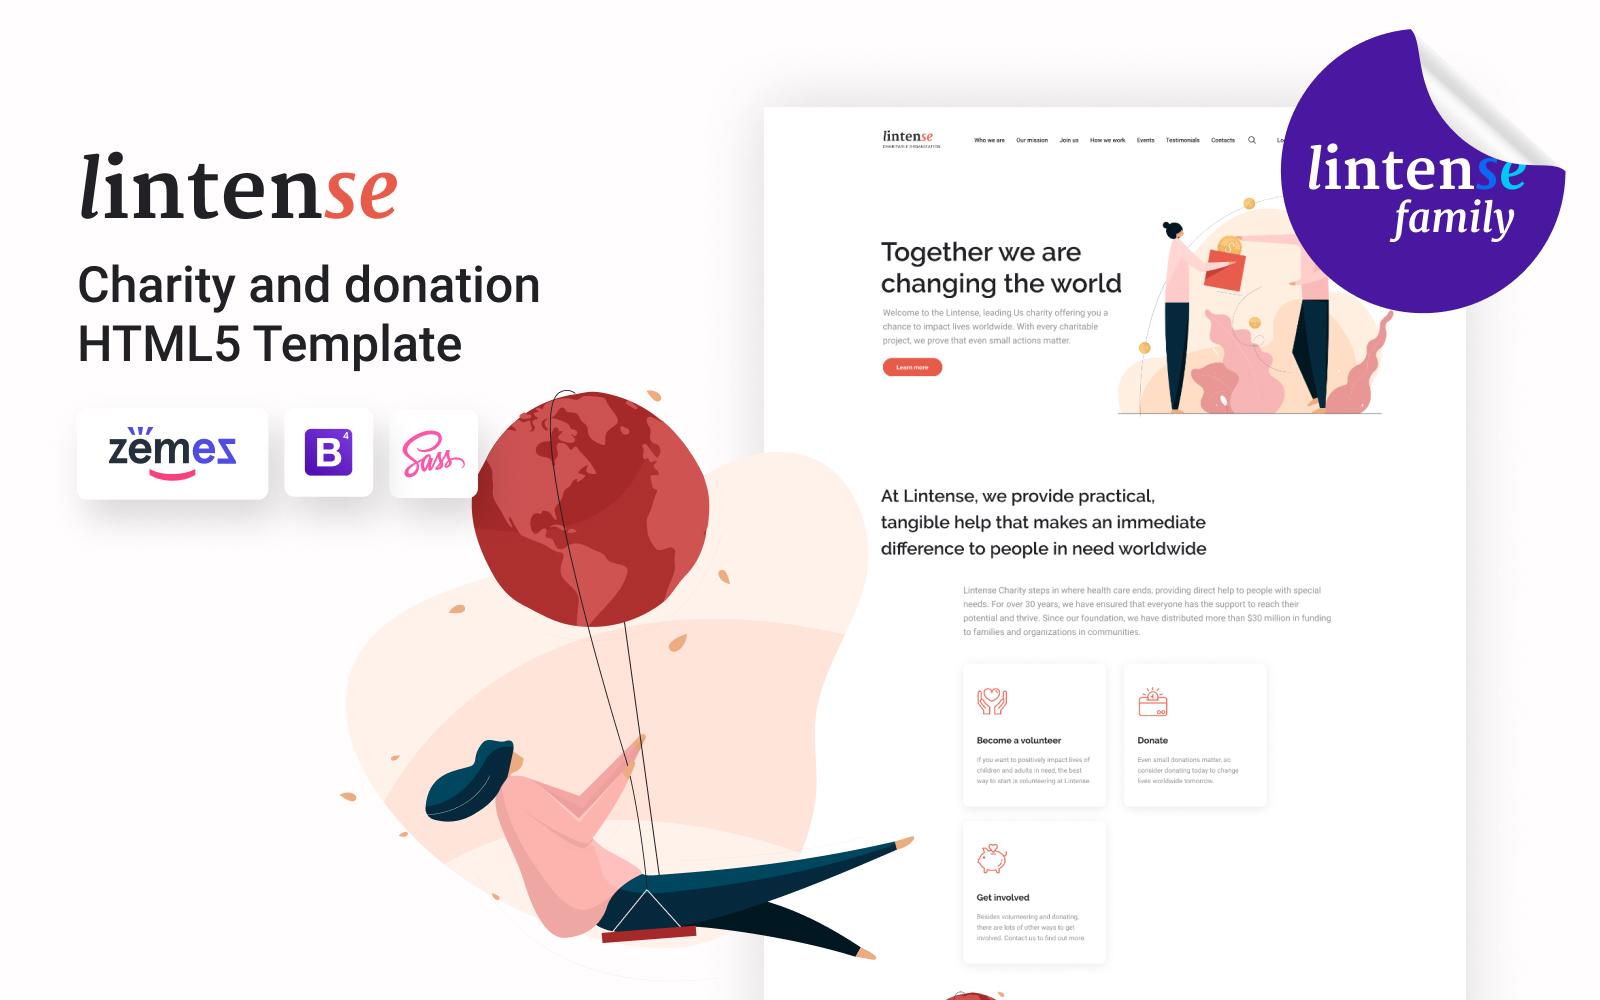 Lintense Charity - Charitable Organization Landing Page Template